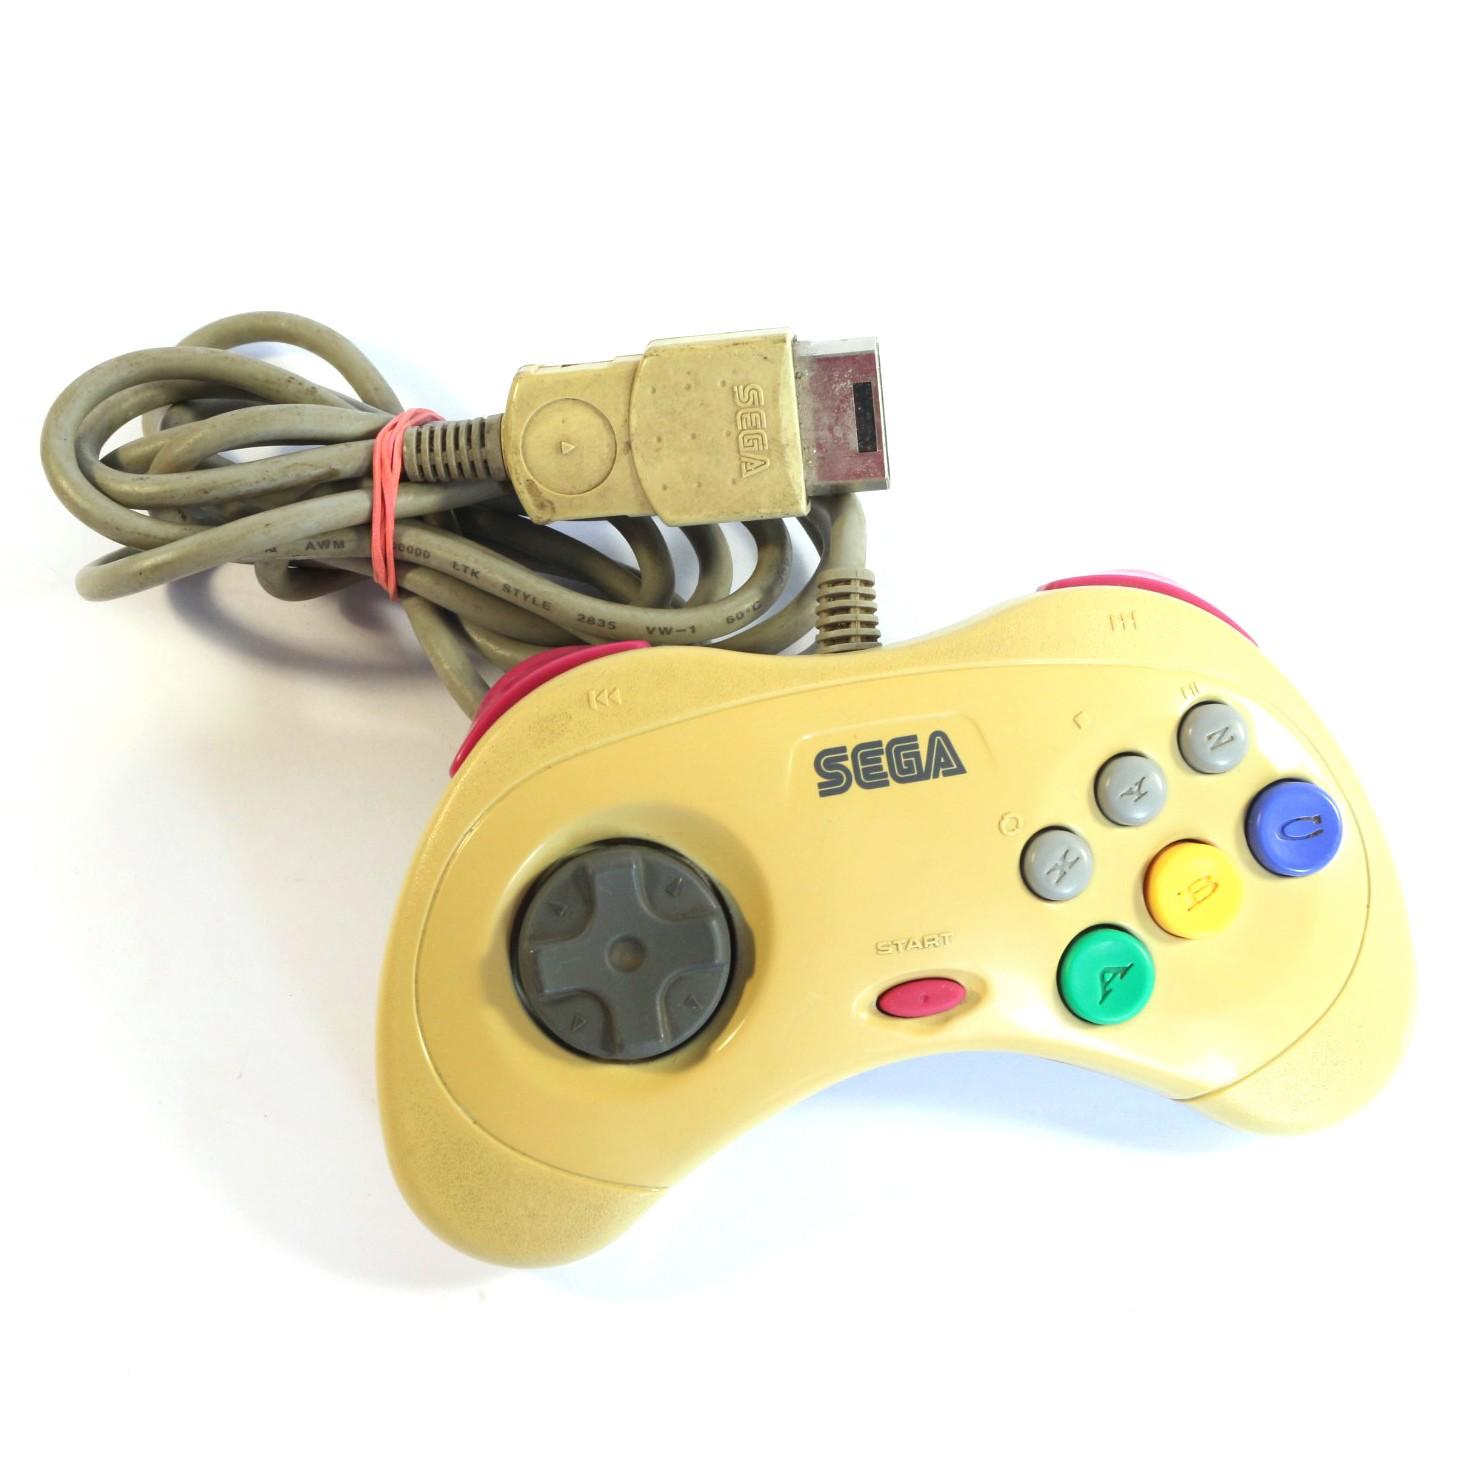 Saturn - Original Controller / Control Pad 2G #weiß HSS-0101 [Sega]